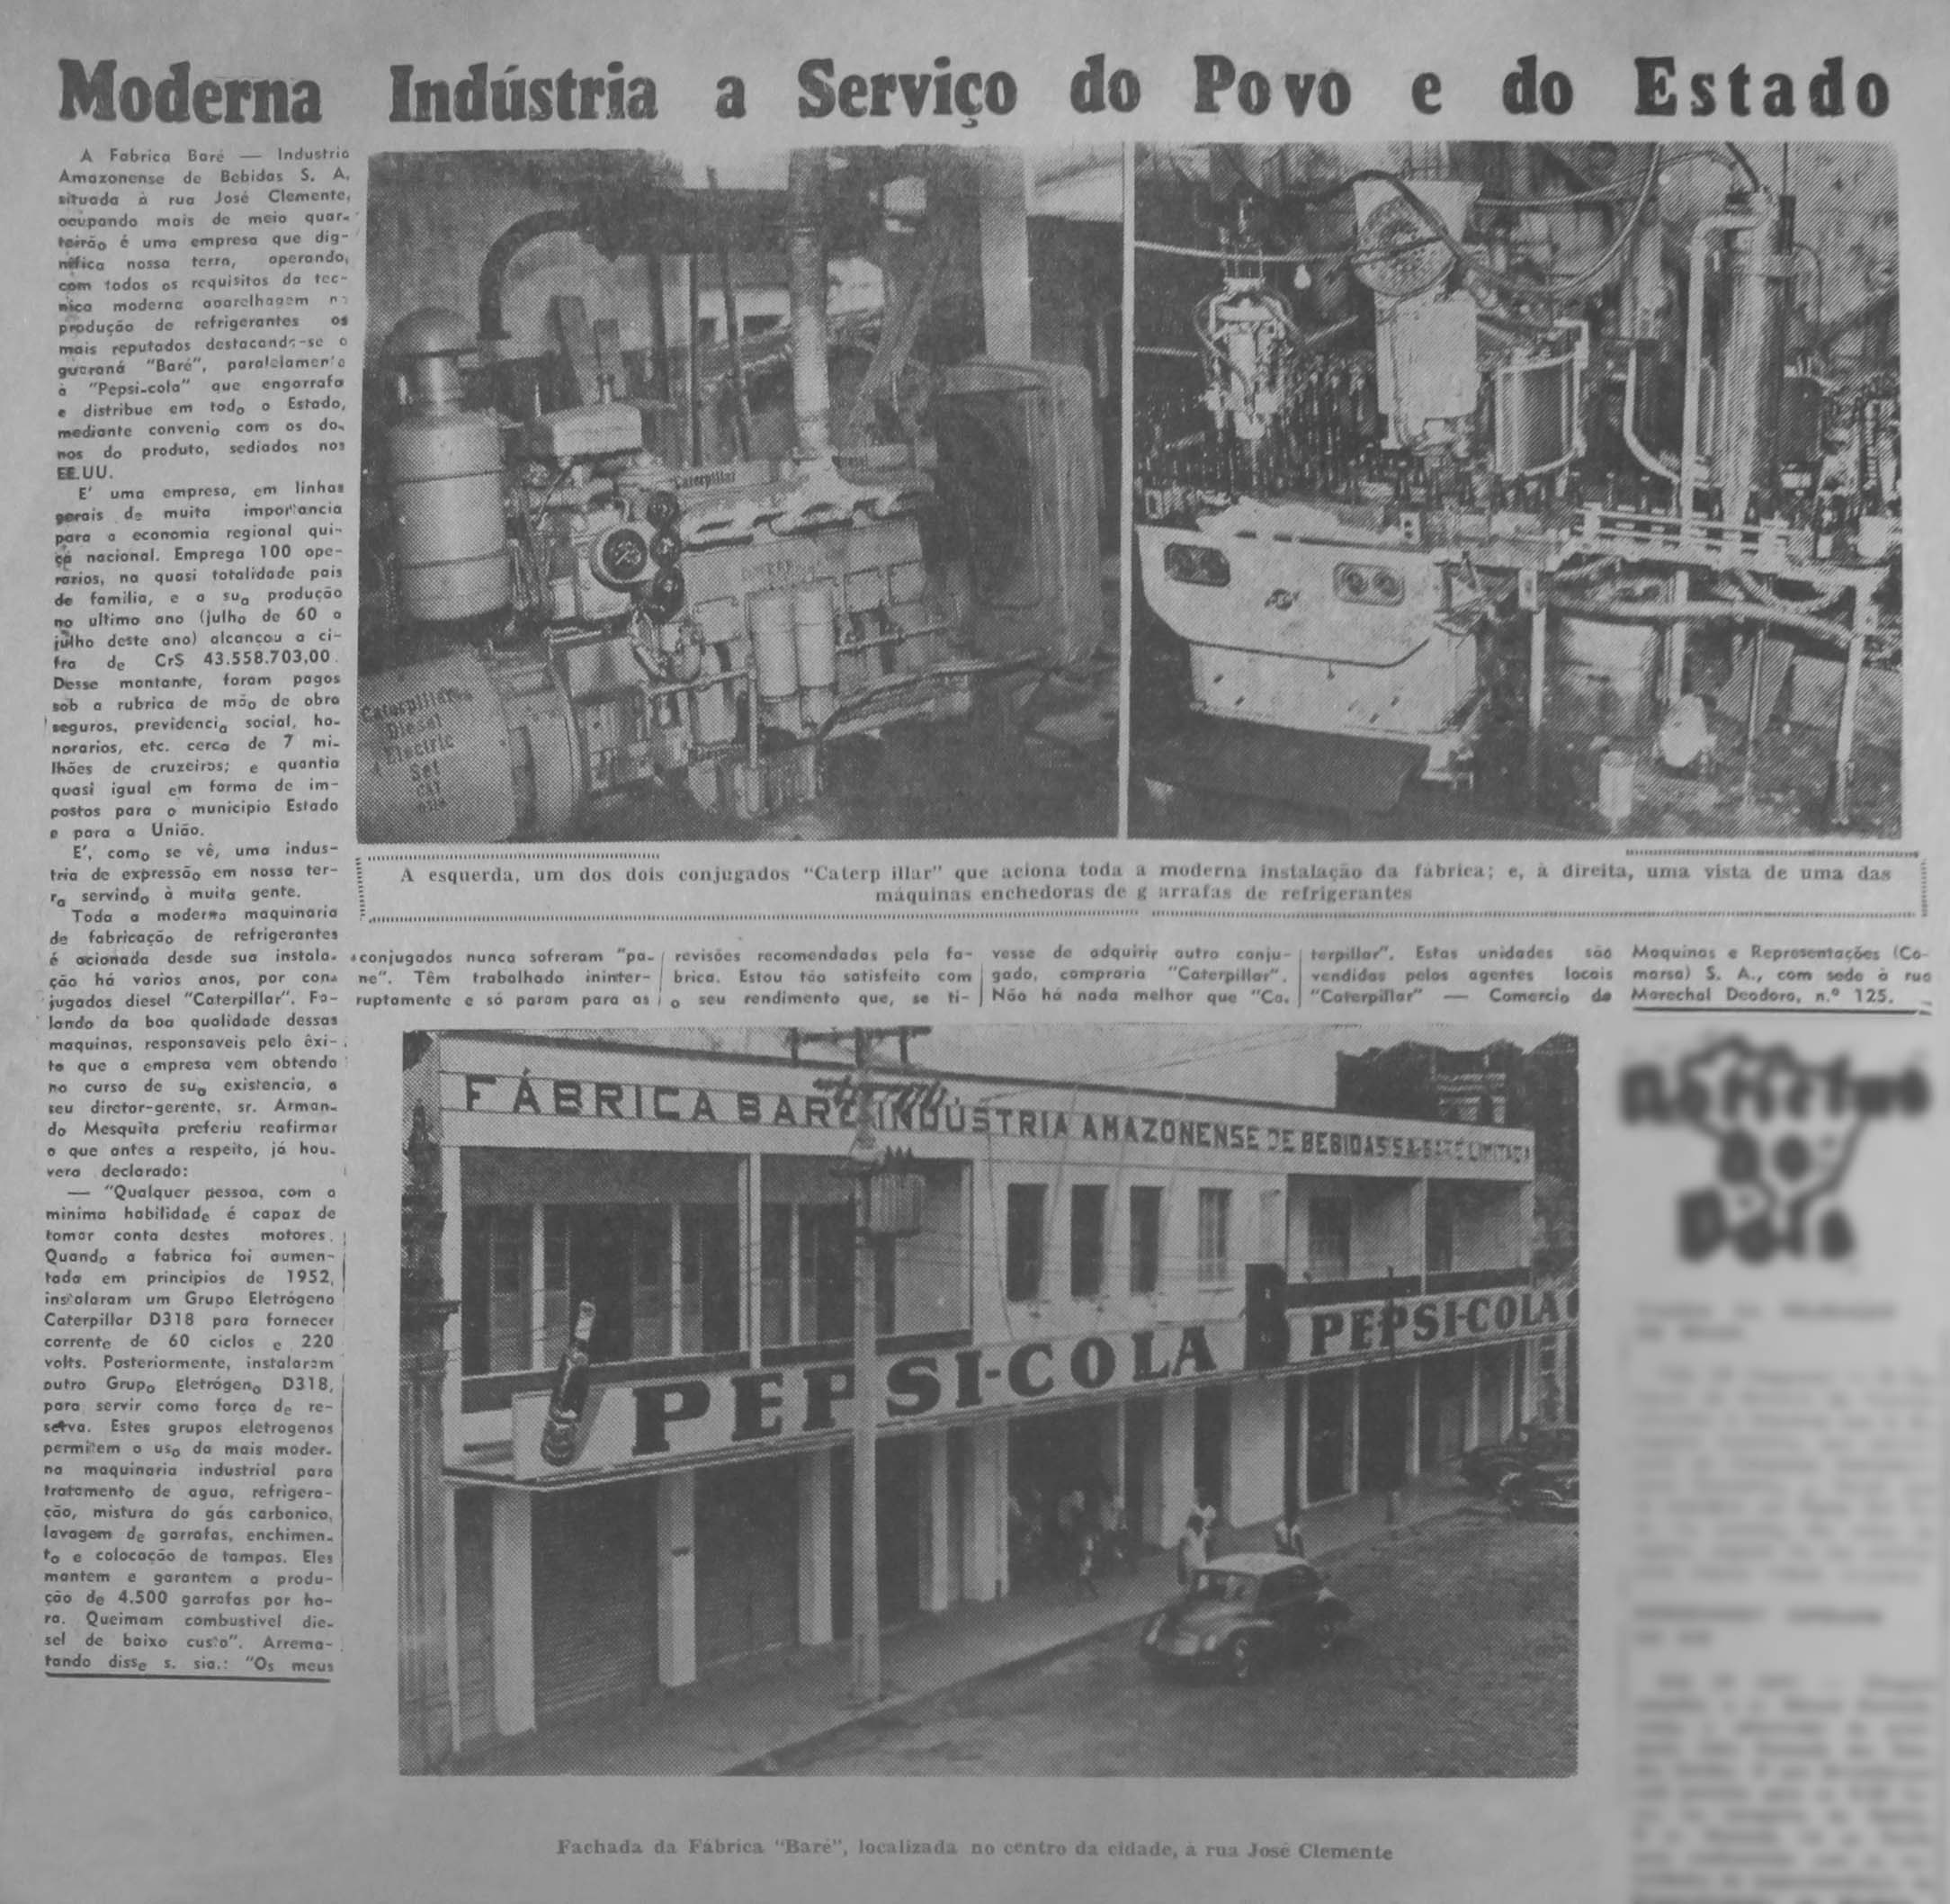 A Moderna Fábrica Baré